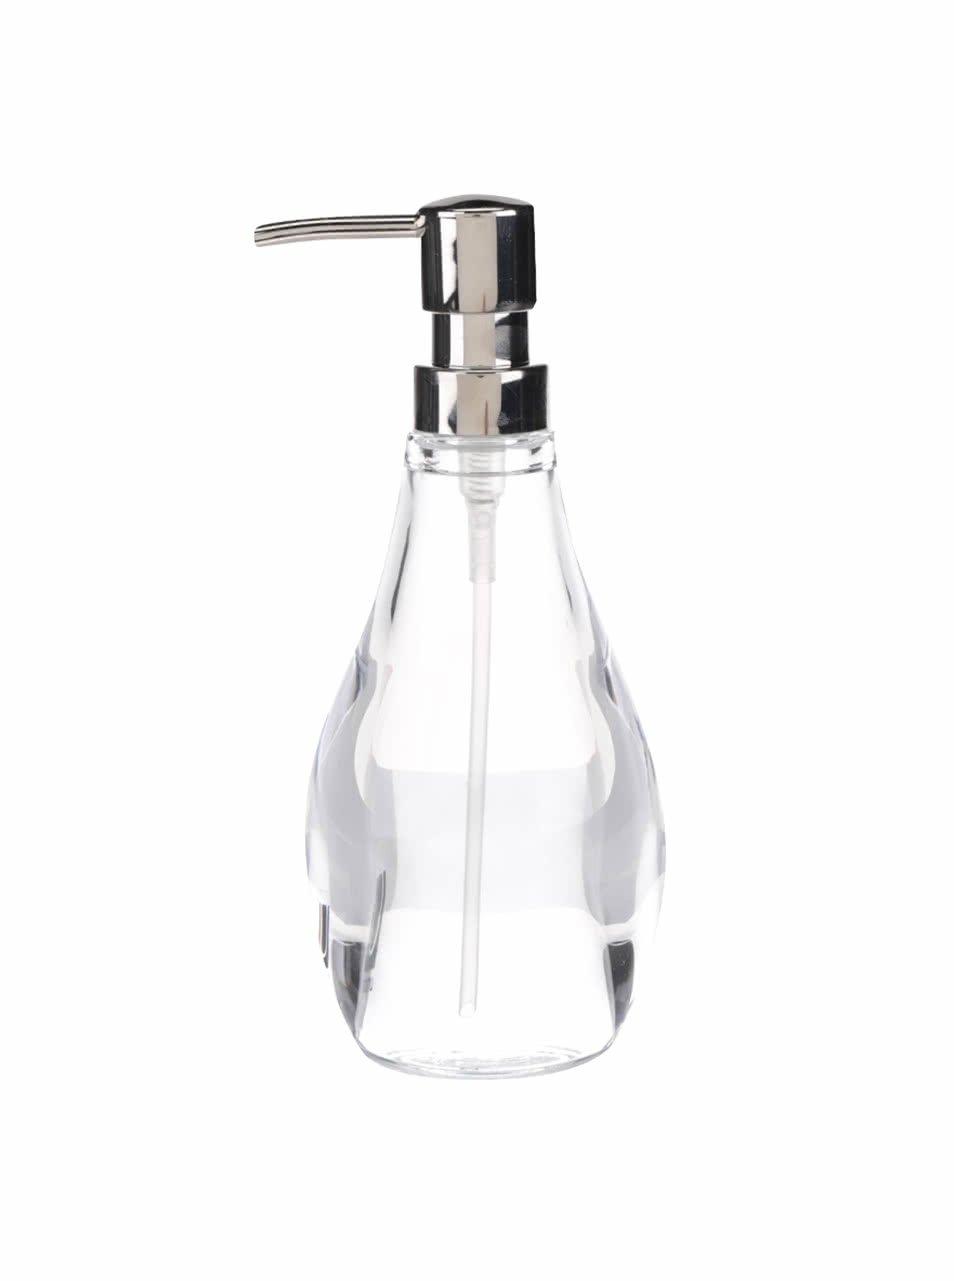 Průhledný dávkovač na mýdlo Umbra Droplet